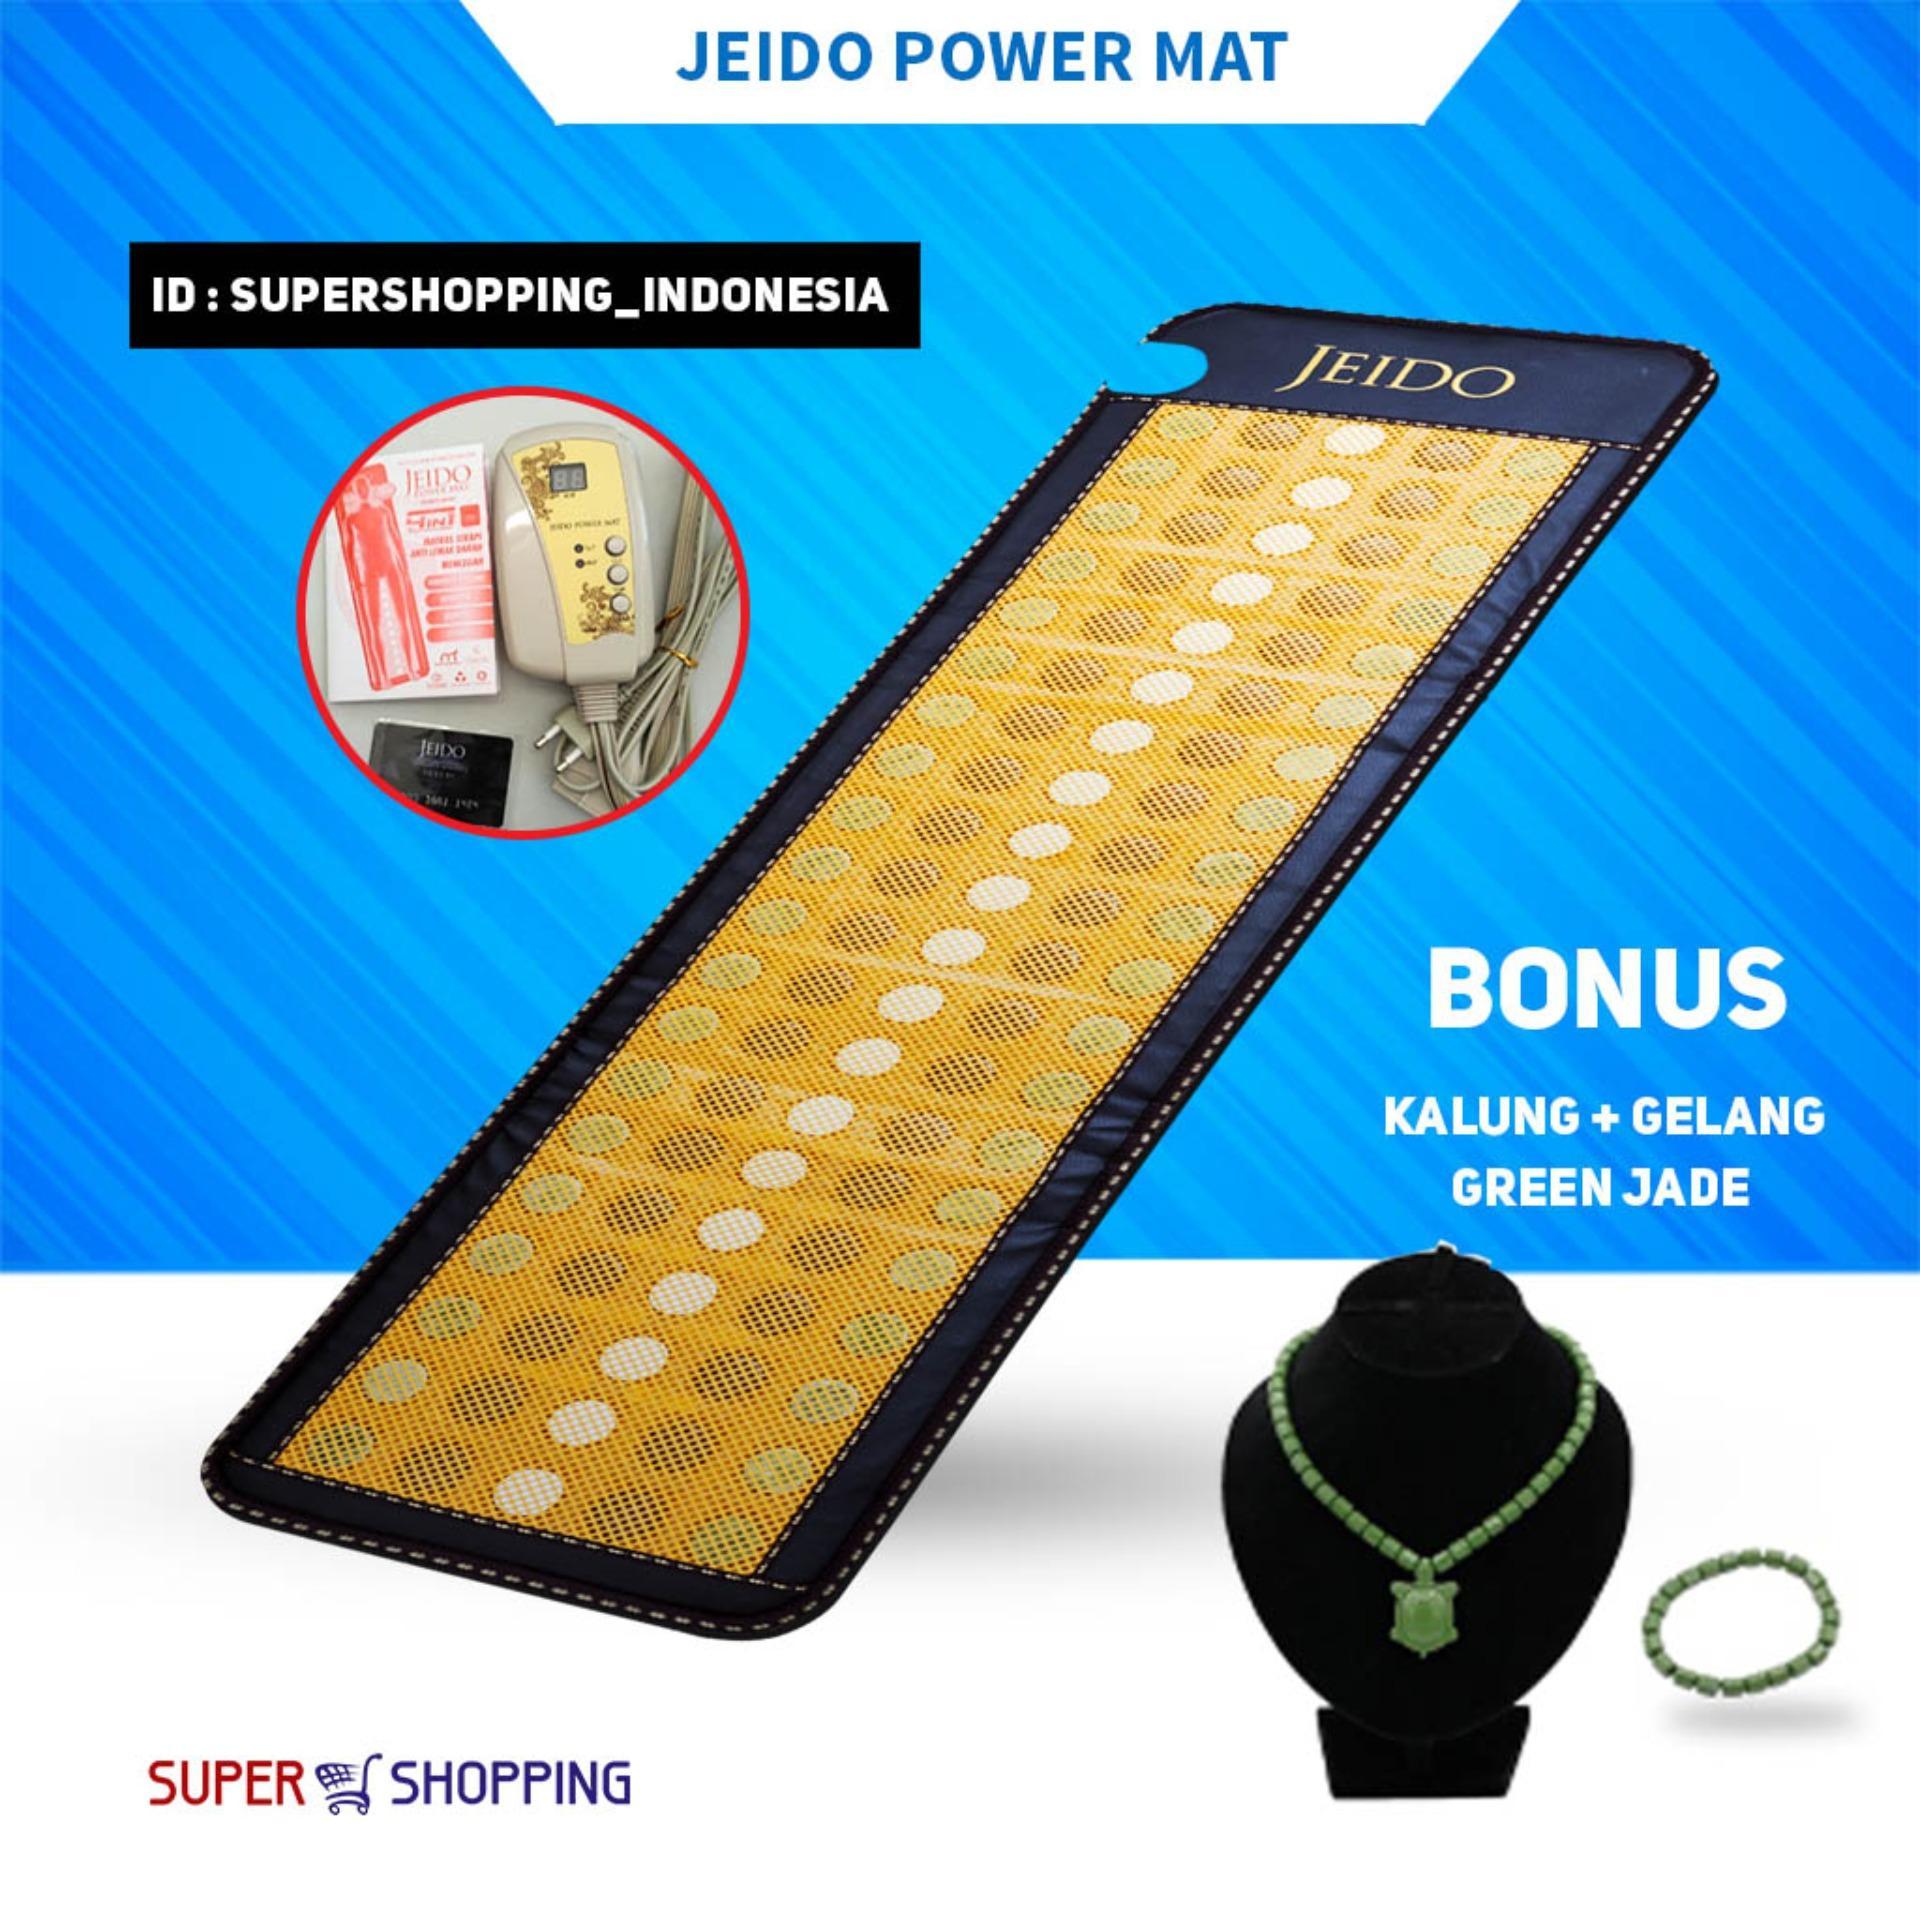 Buy Sell Cheapest Original Gelang Kesehatan Best Quality Product Ginsamyong Kalung Asli Jeido Power Mat Matras Bonus